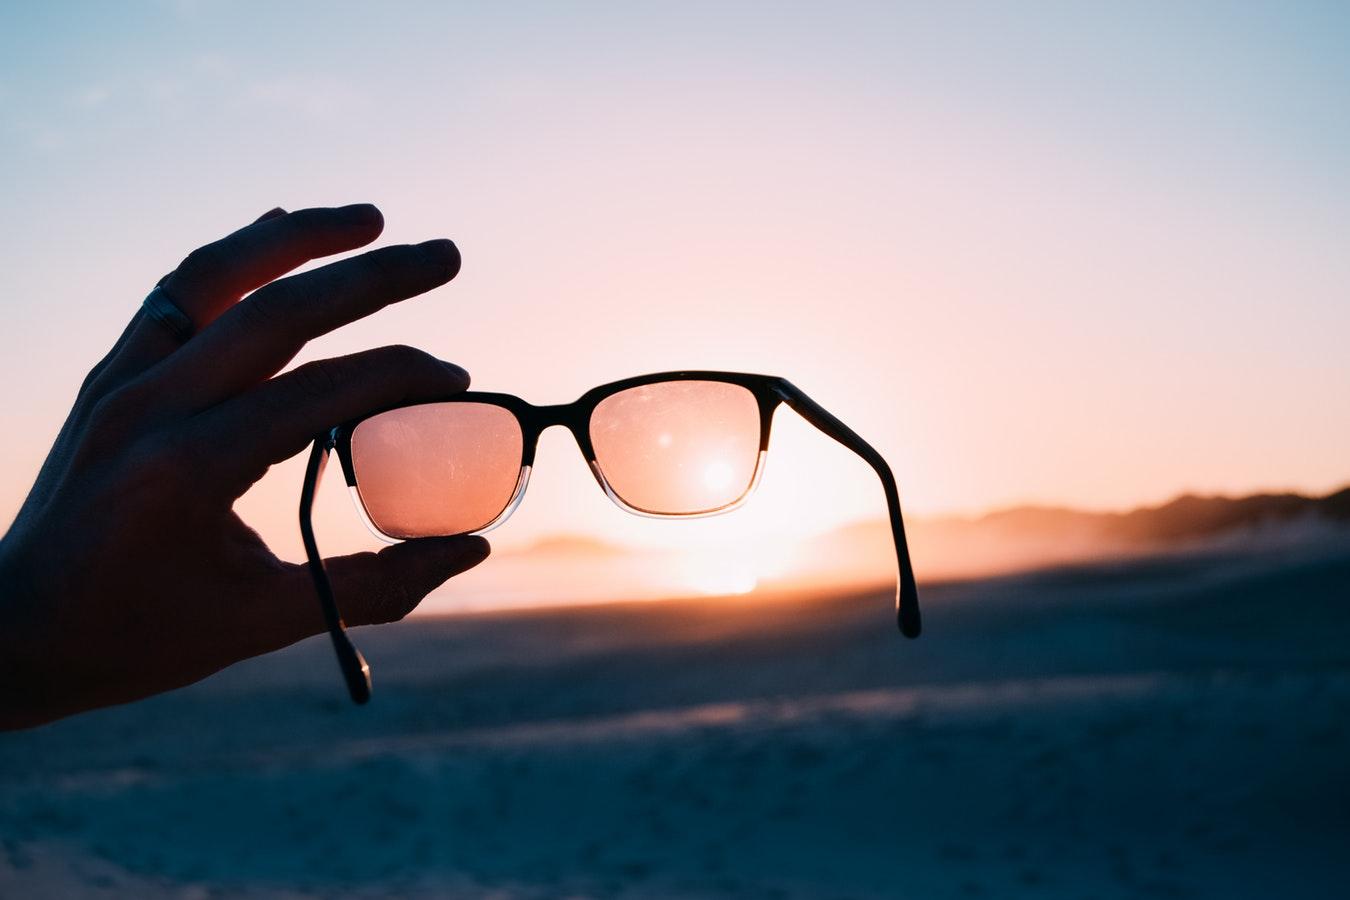 abac04240ab1 10 Best Running Sunglasses in 2019 [ULTIMATE GUIDE]   WalkJogRun